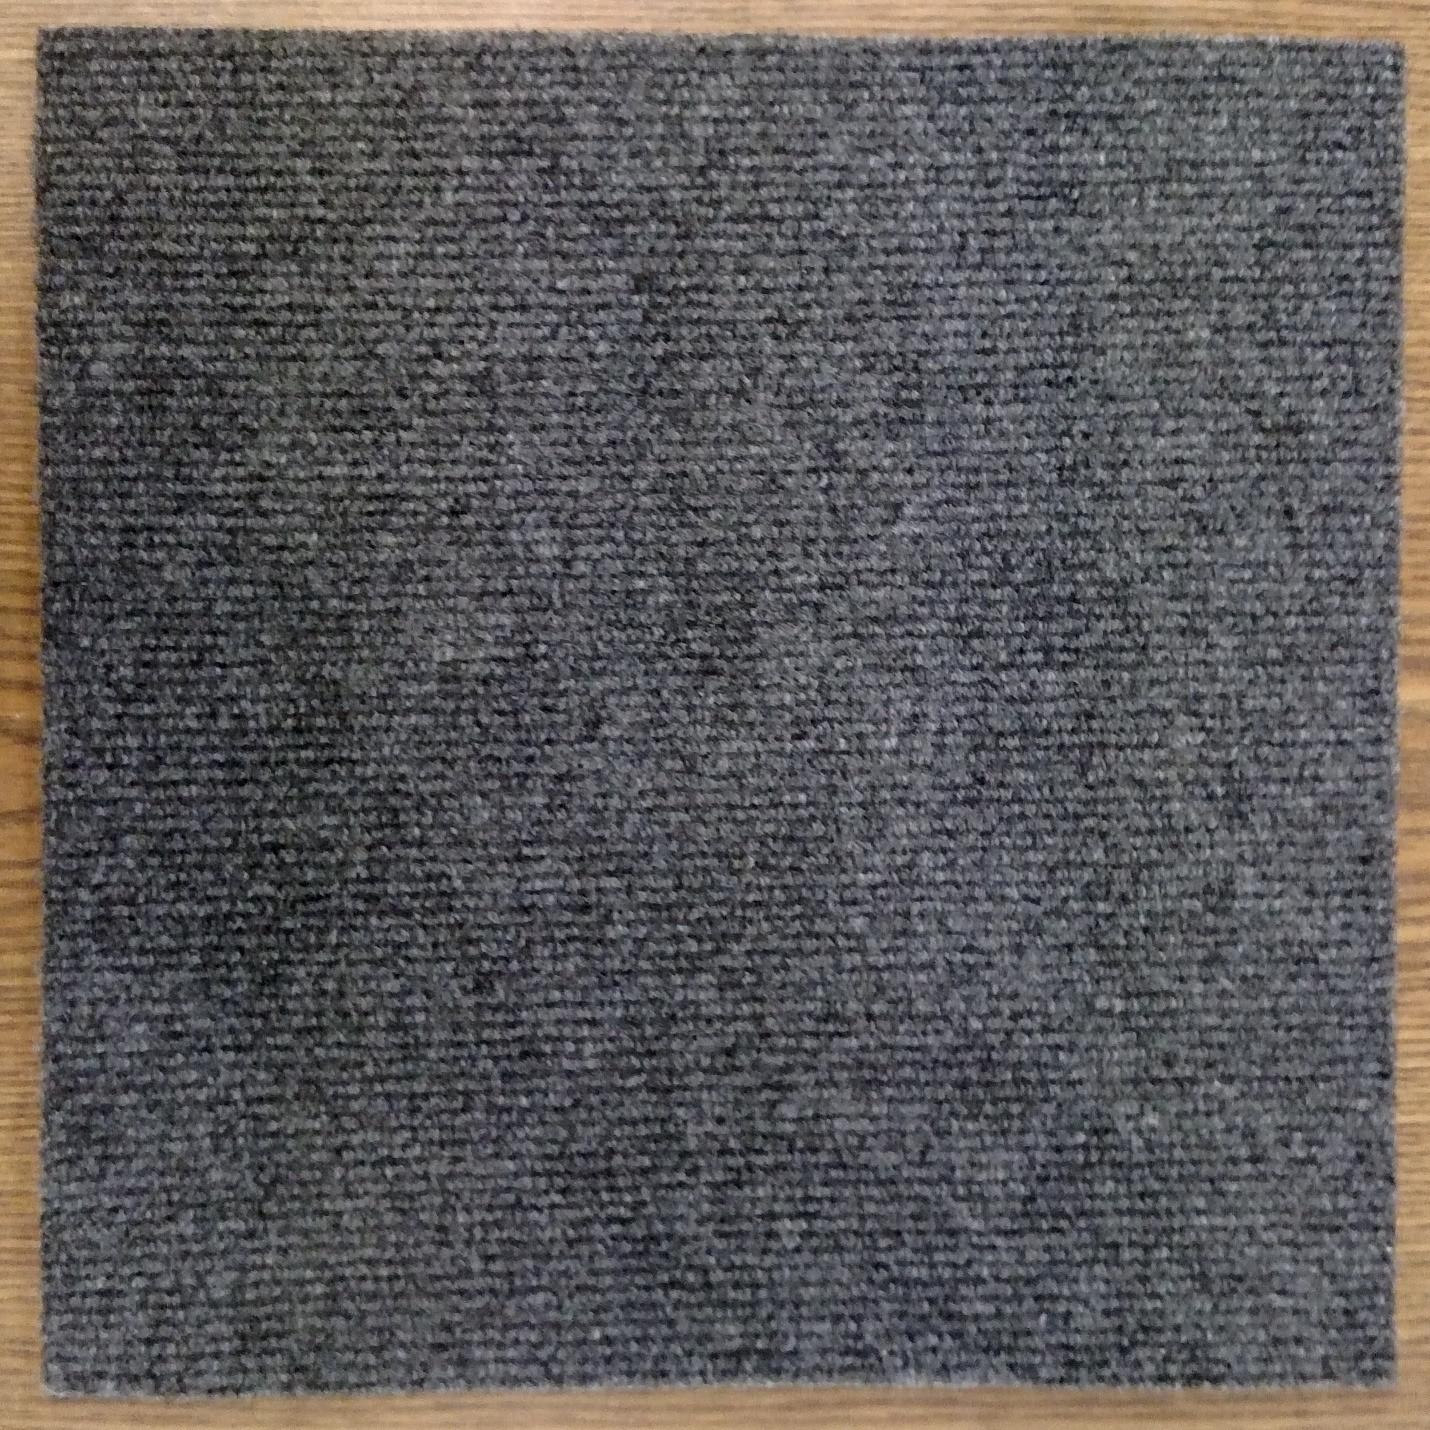 Peel And Stick 36 sq. ft. Charcoal Grey Carpet Tiles (Cha...